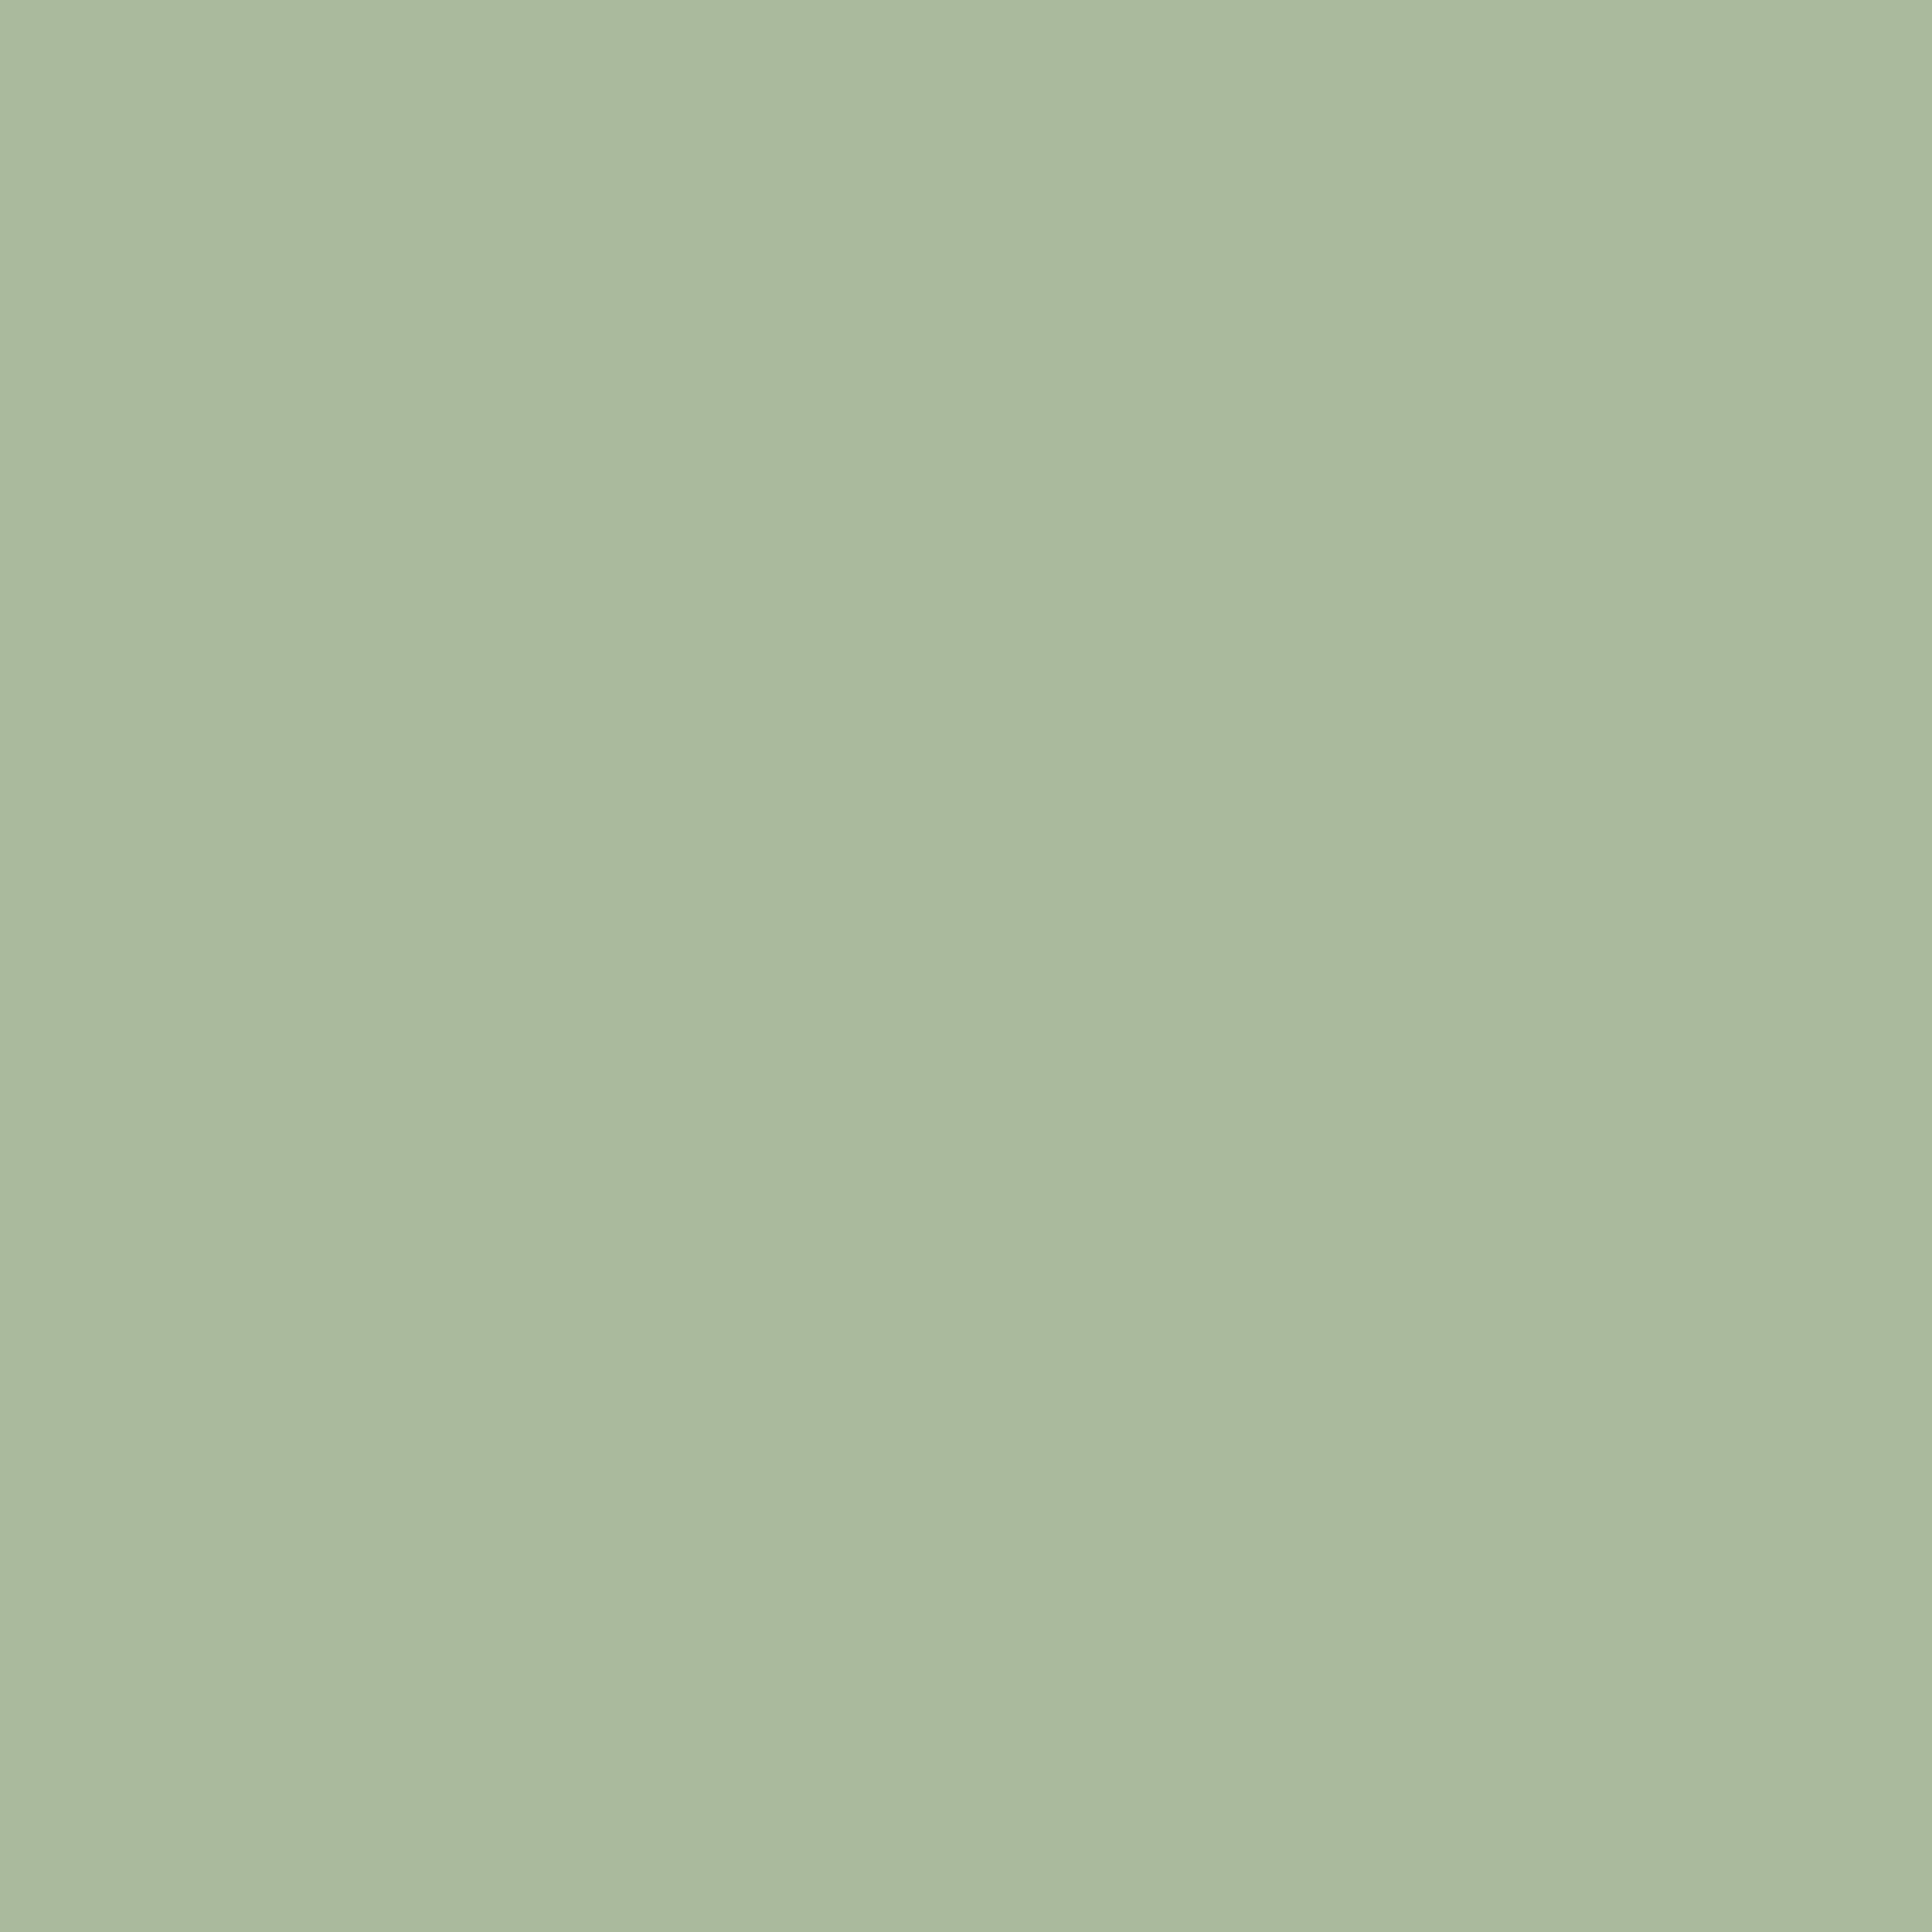 2048x2048 Laurel Green Solid Color Background